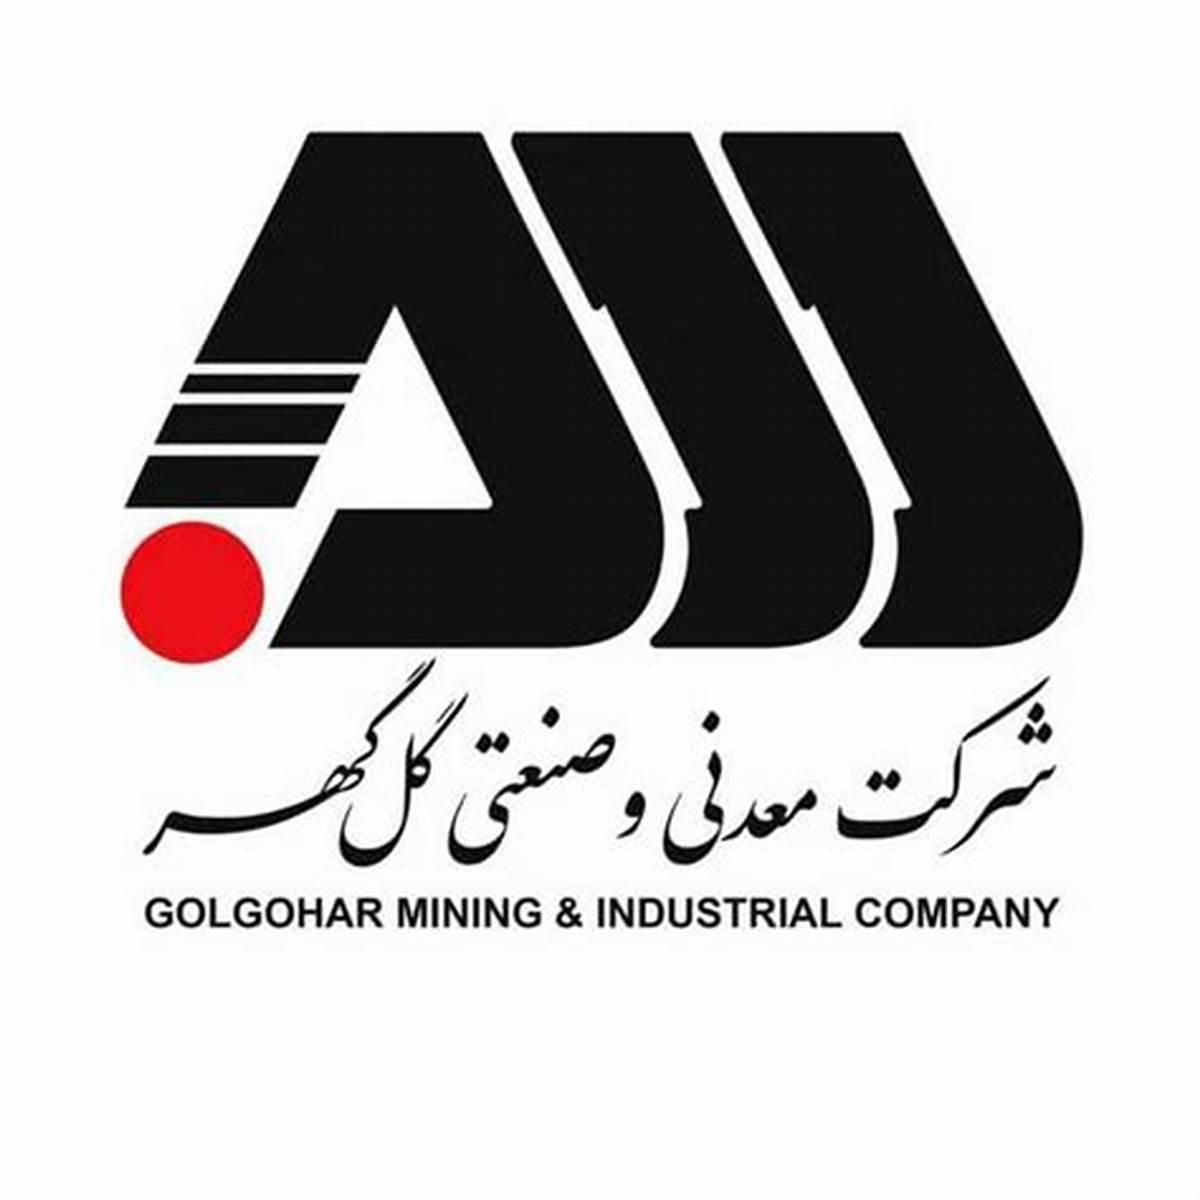 معدنی و صنعتی گل گهر